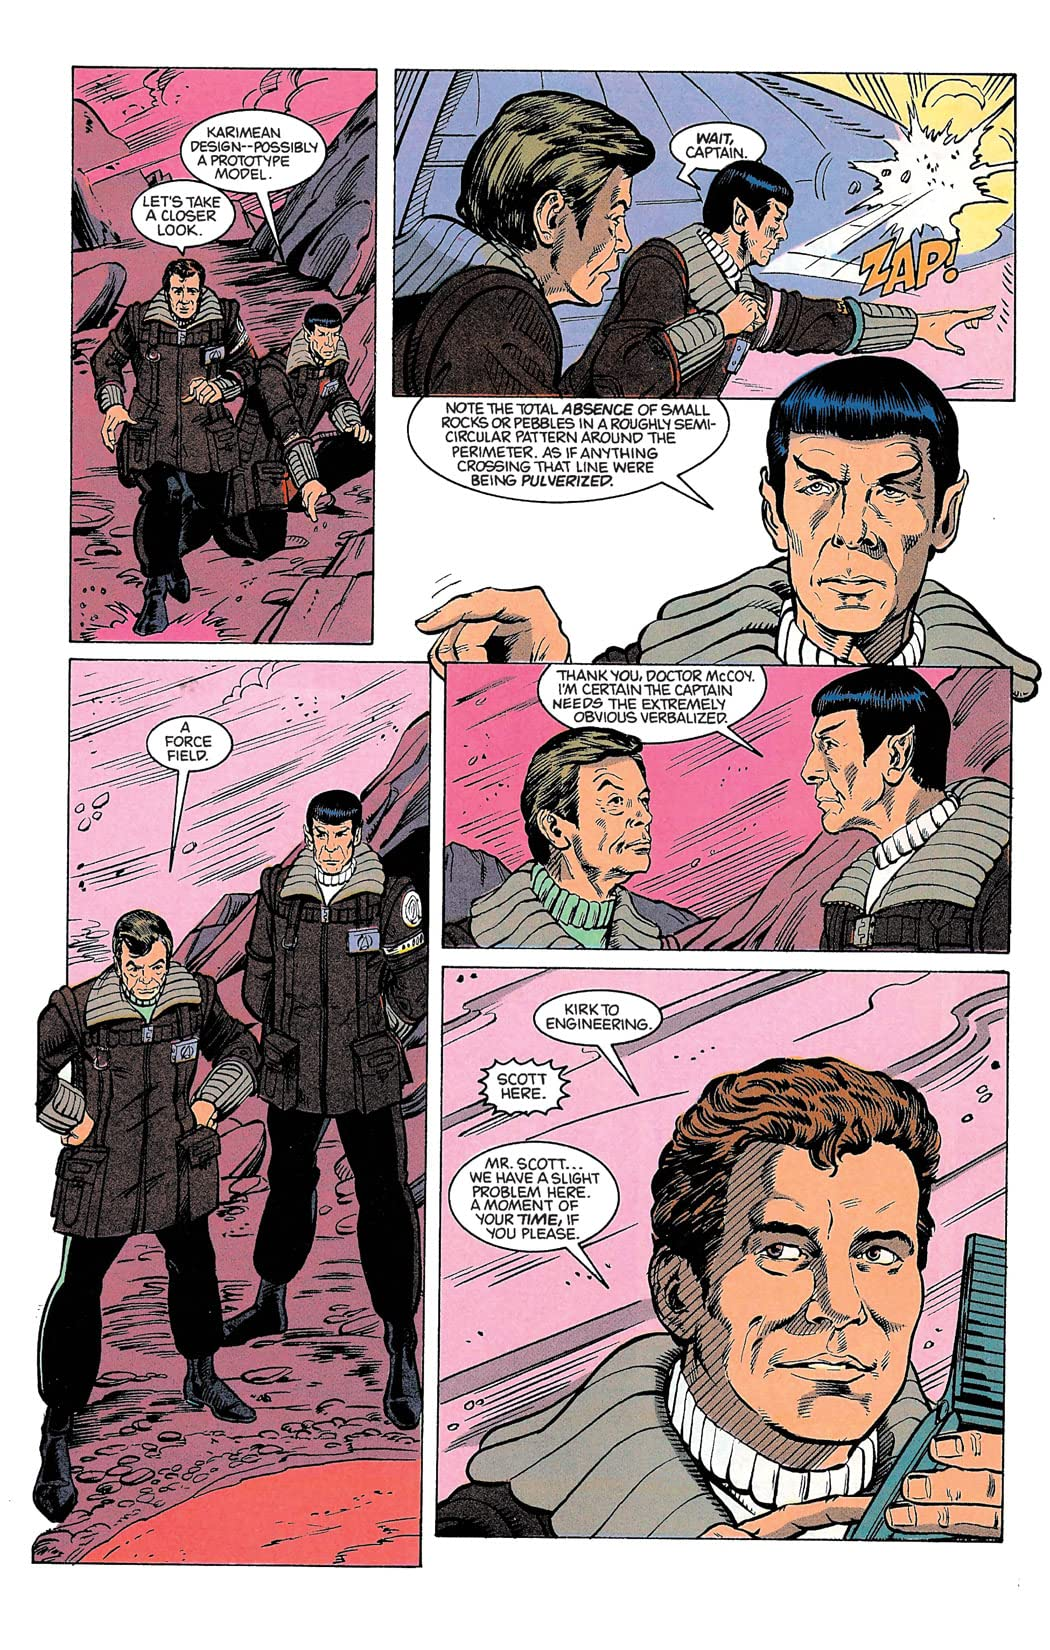 Star Trek Archives: The Best of Peter David #2